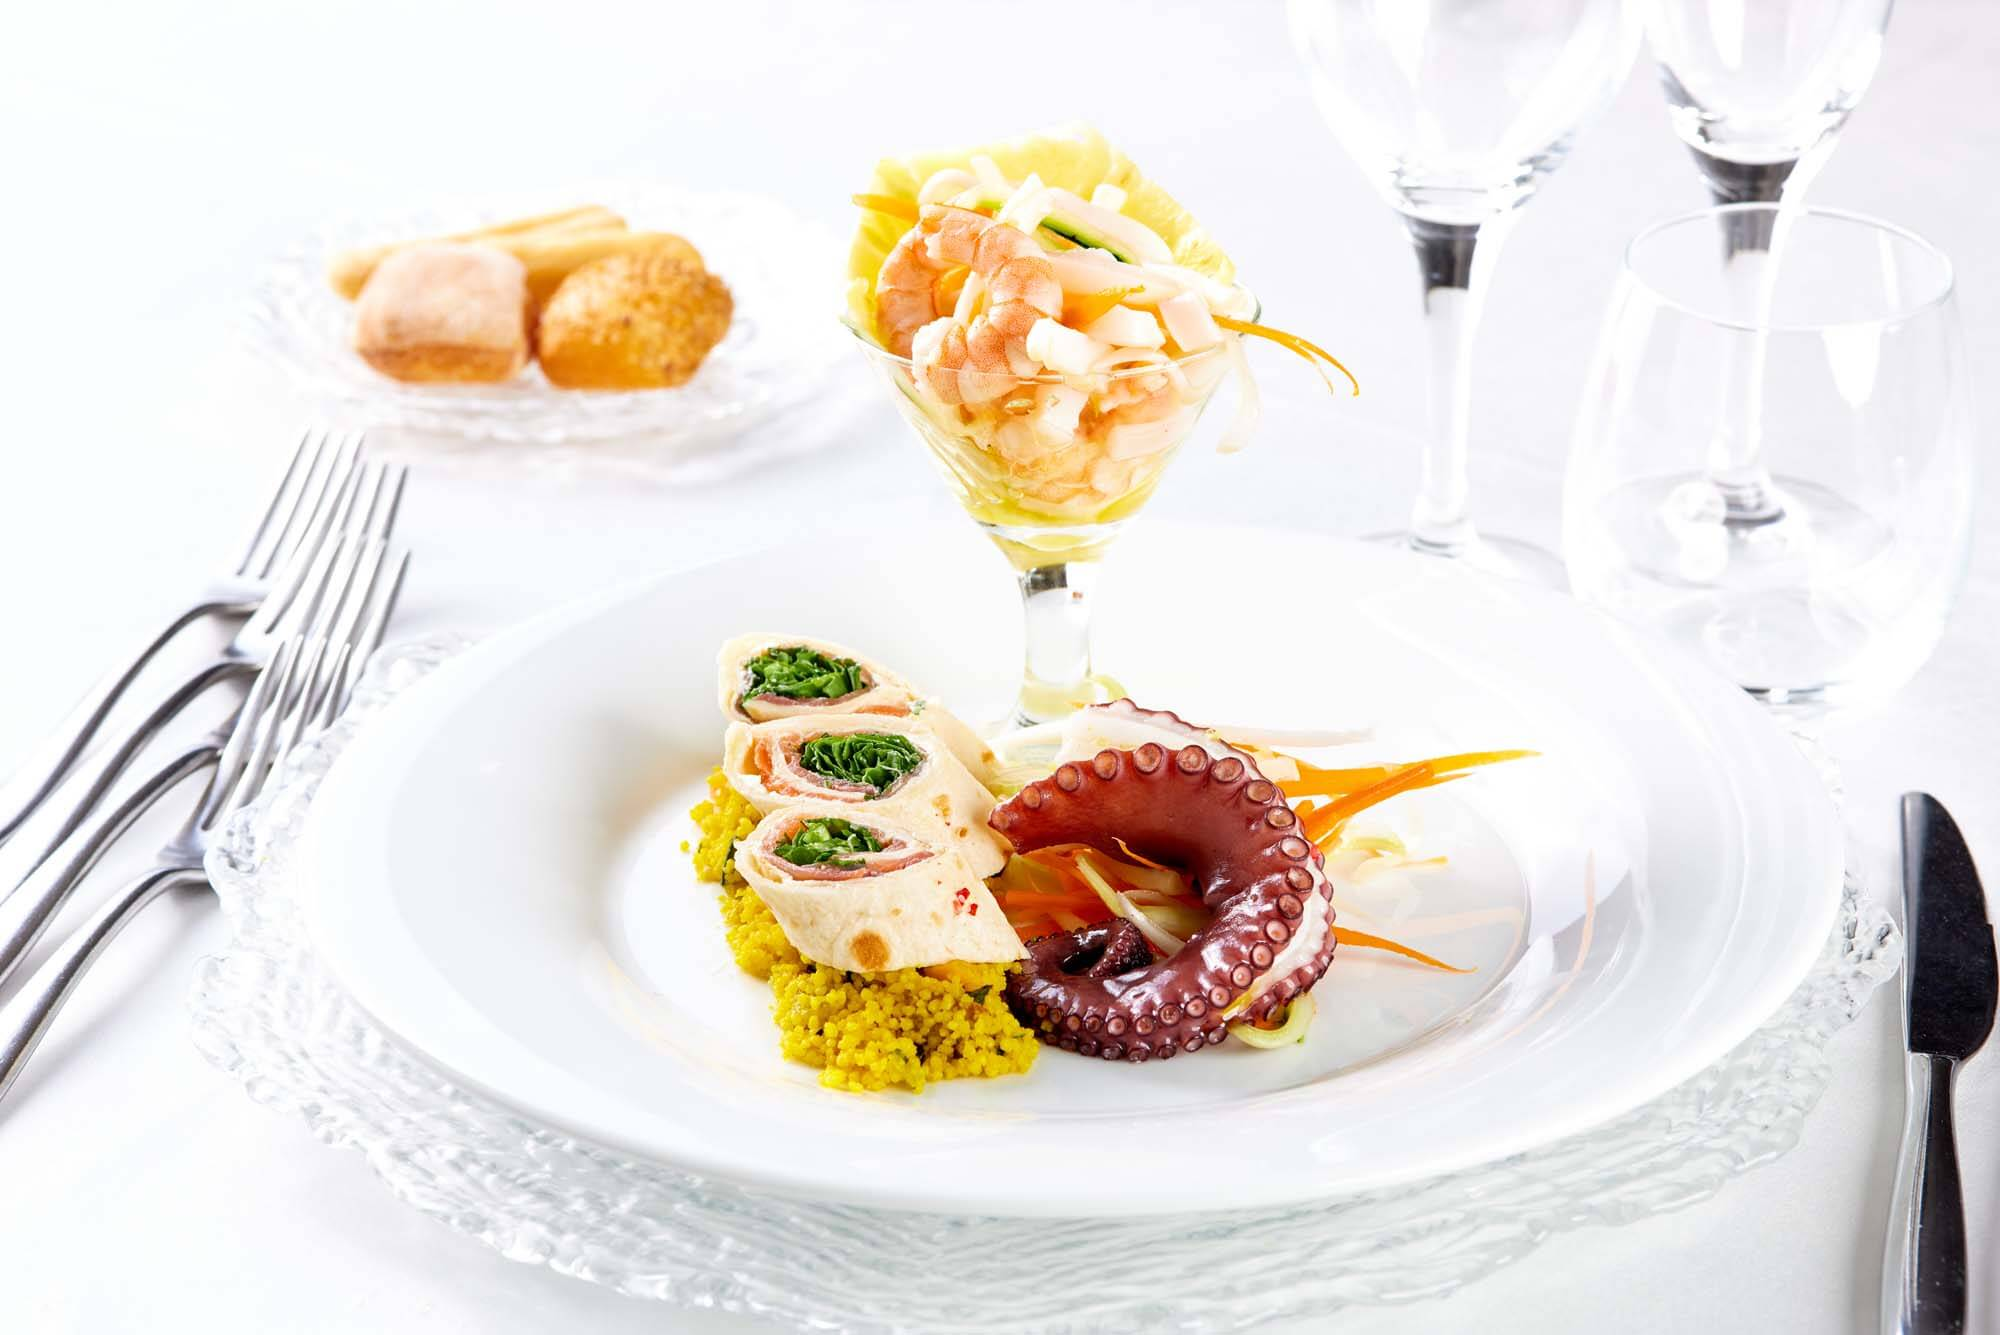 bbadv-photoshooting-food-villa-fabiana-07